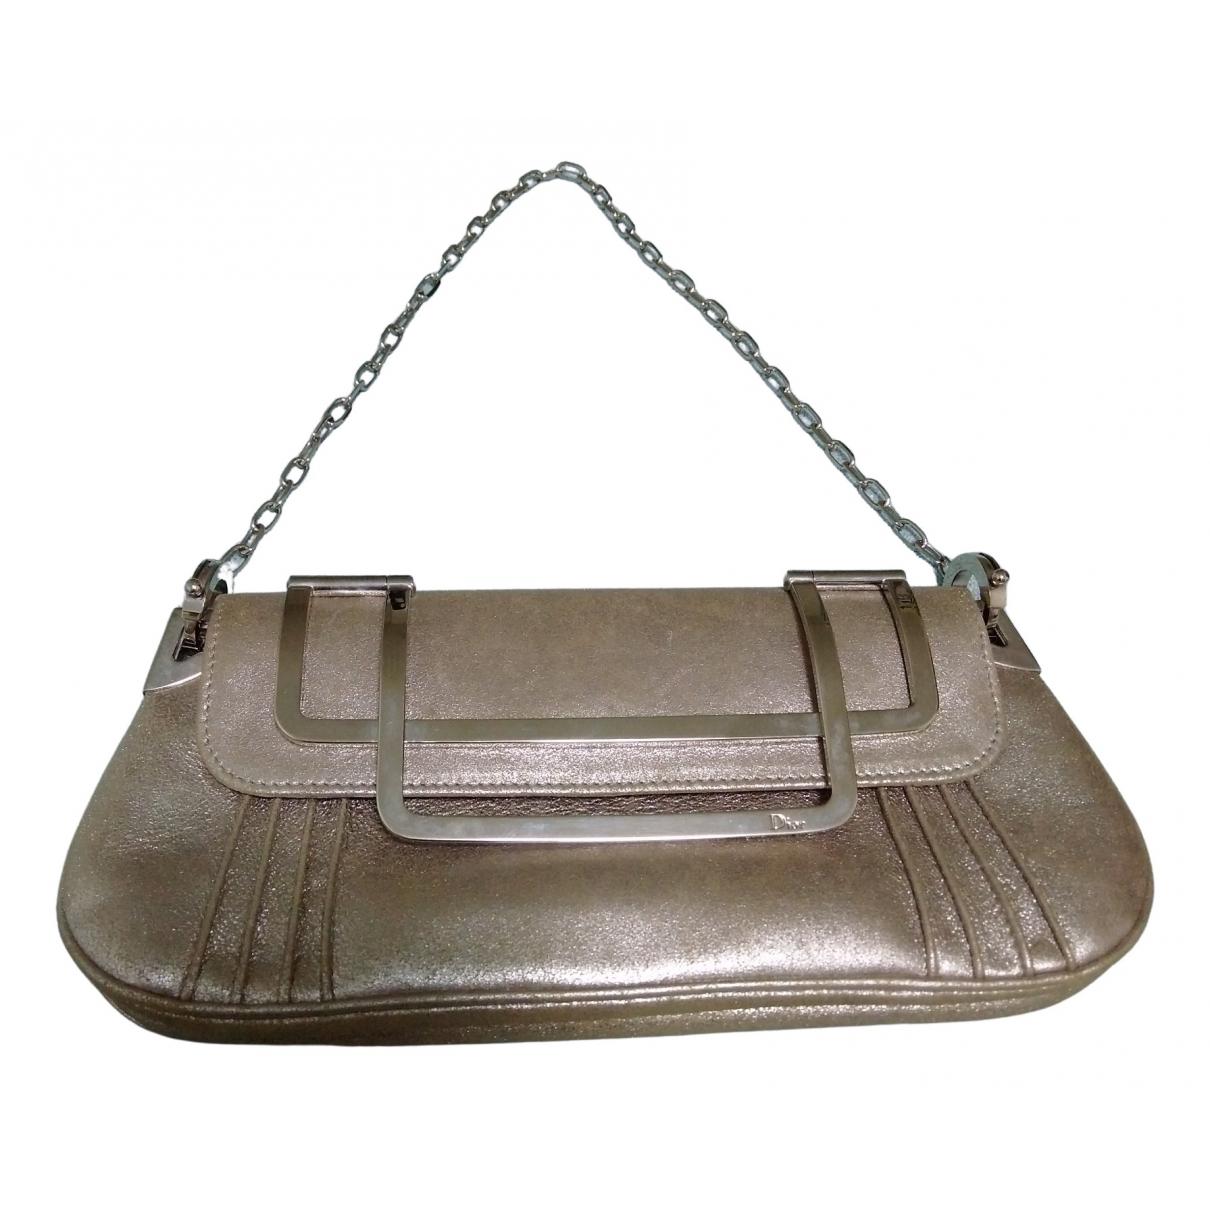 Dior \N Silver Leather Clutch bag for Women \N